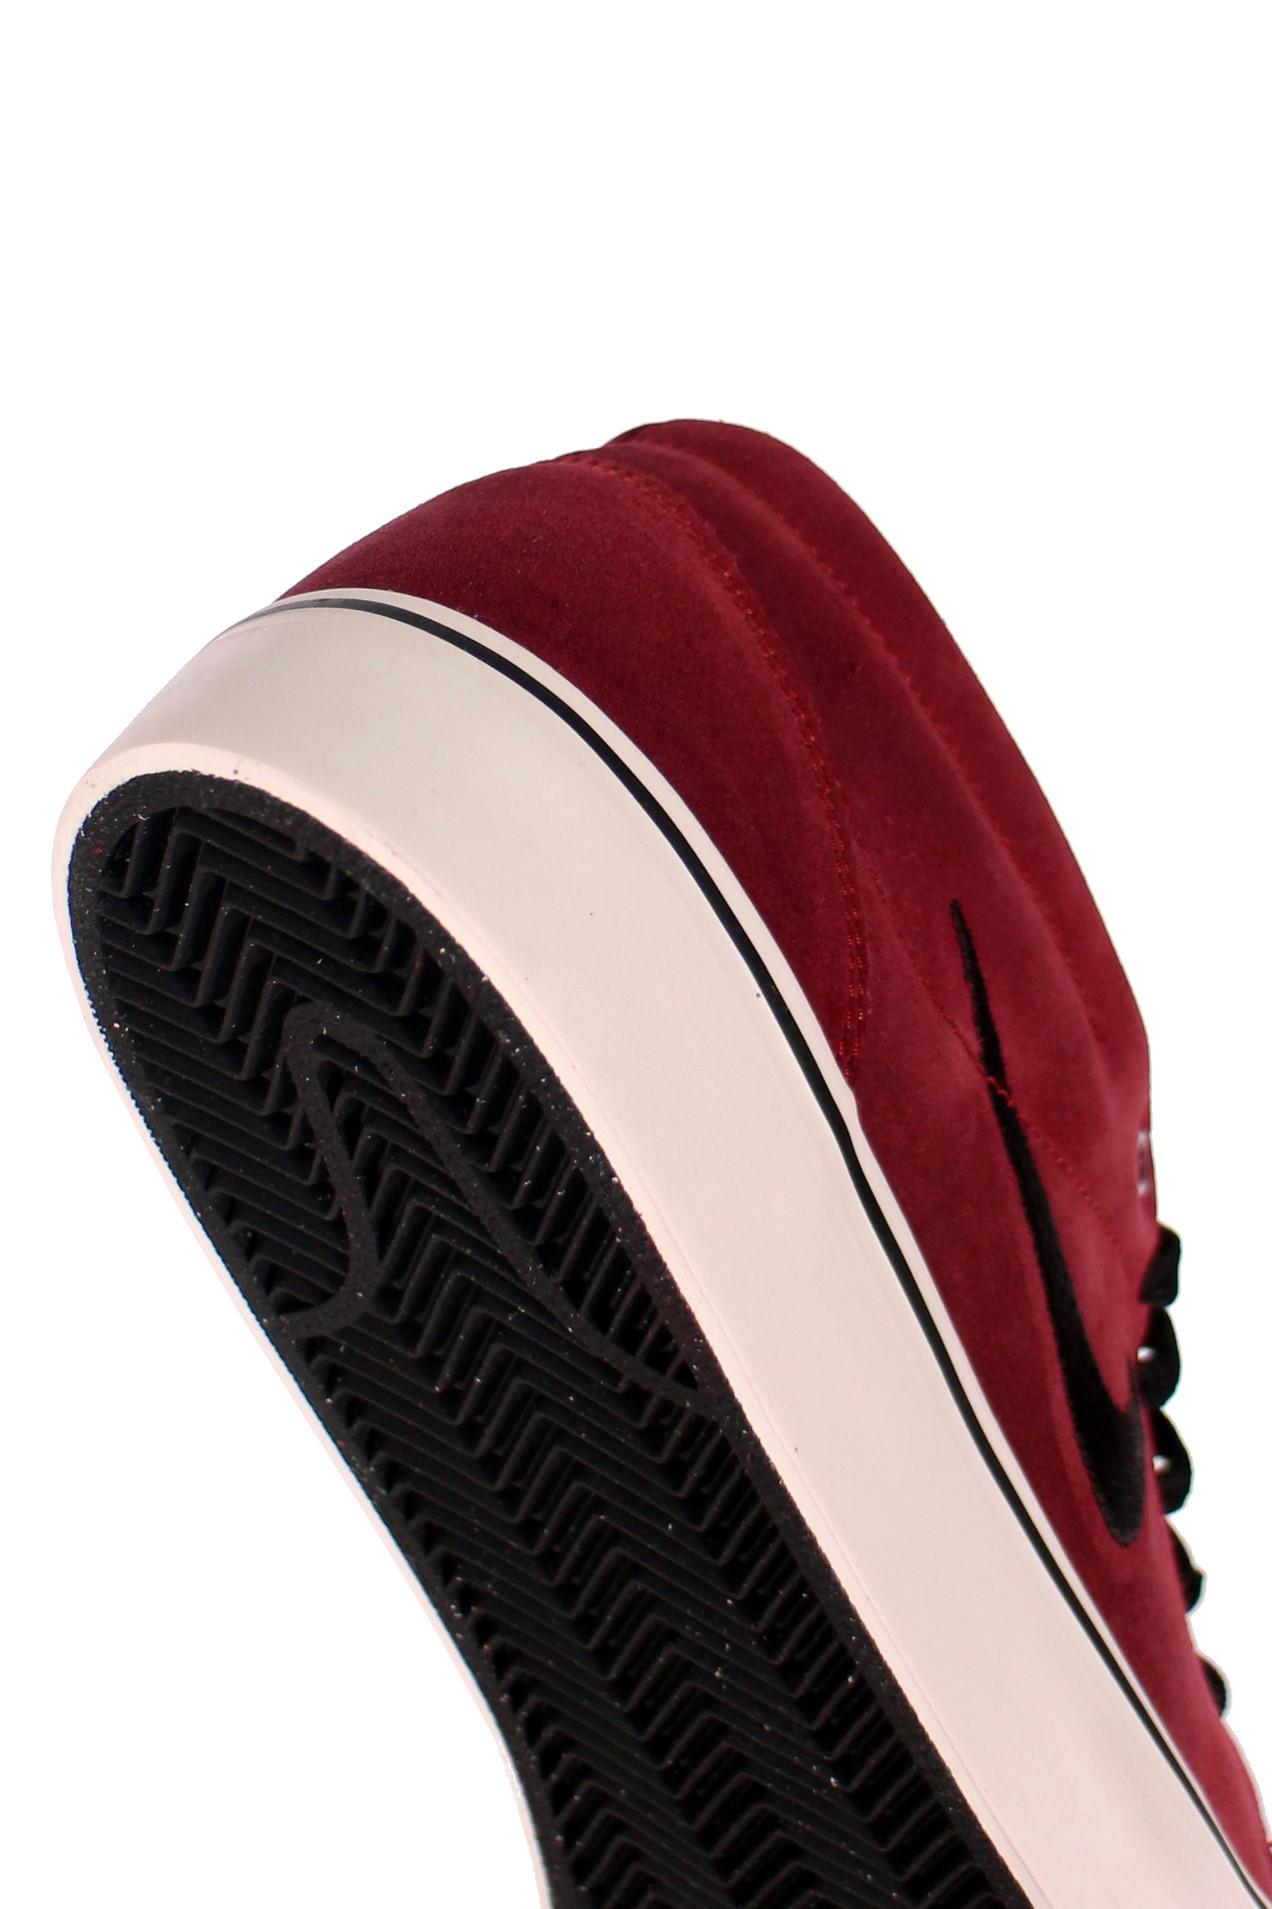 Buty Nike Satire Mid (Crimson/ Black/ White Gum)